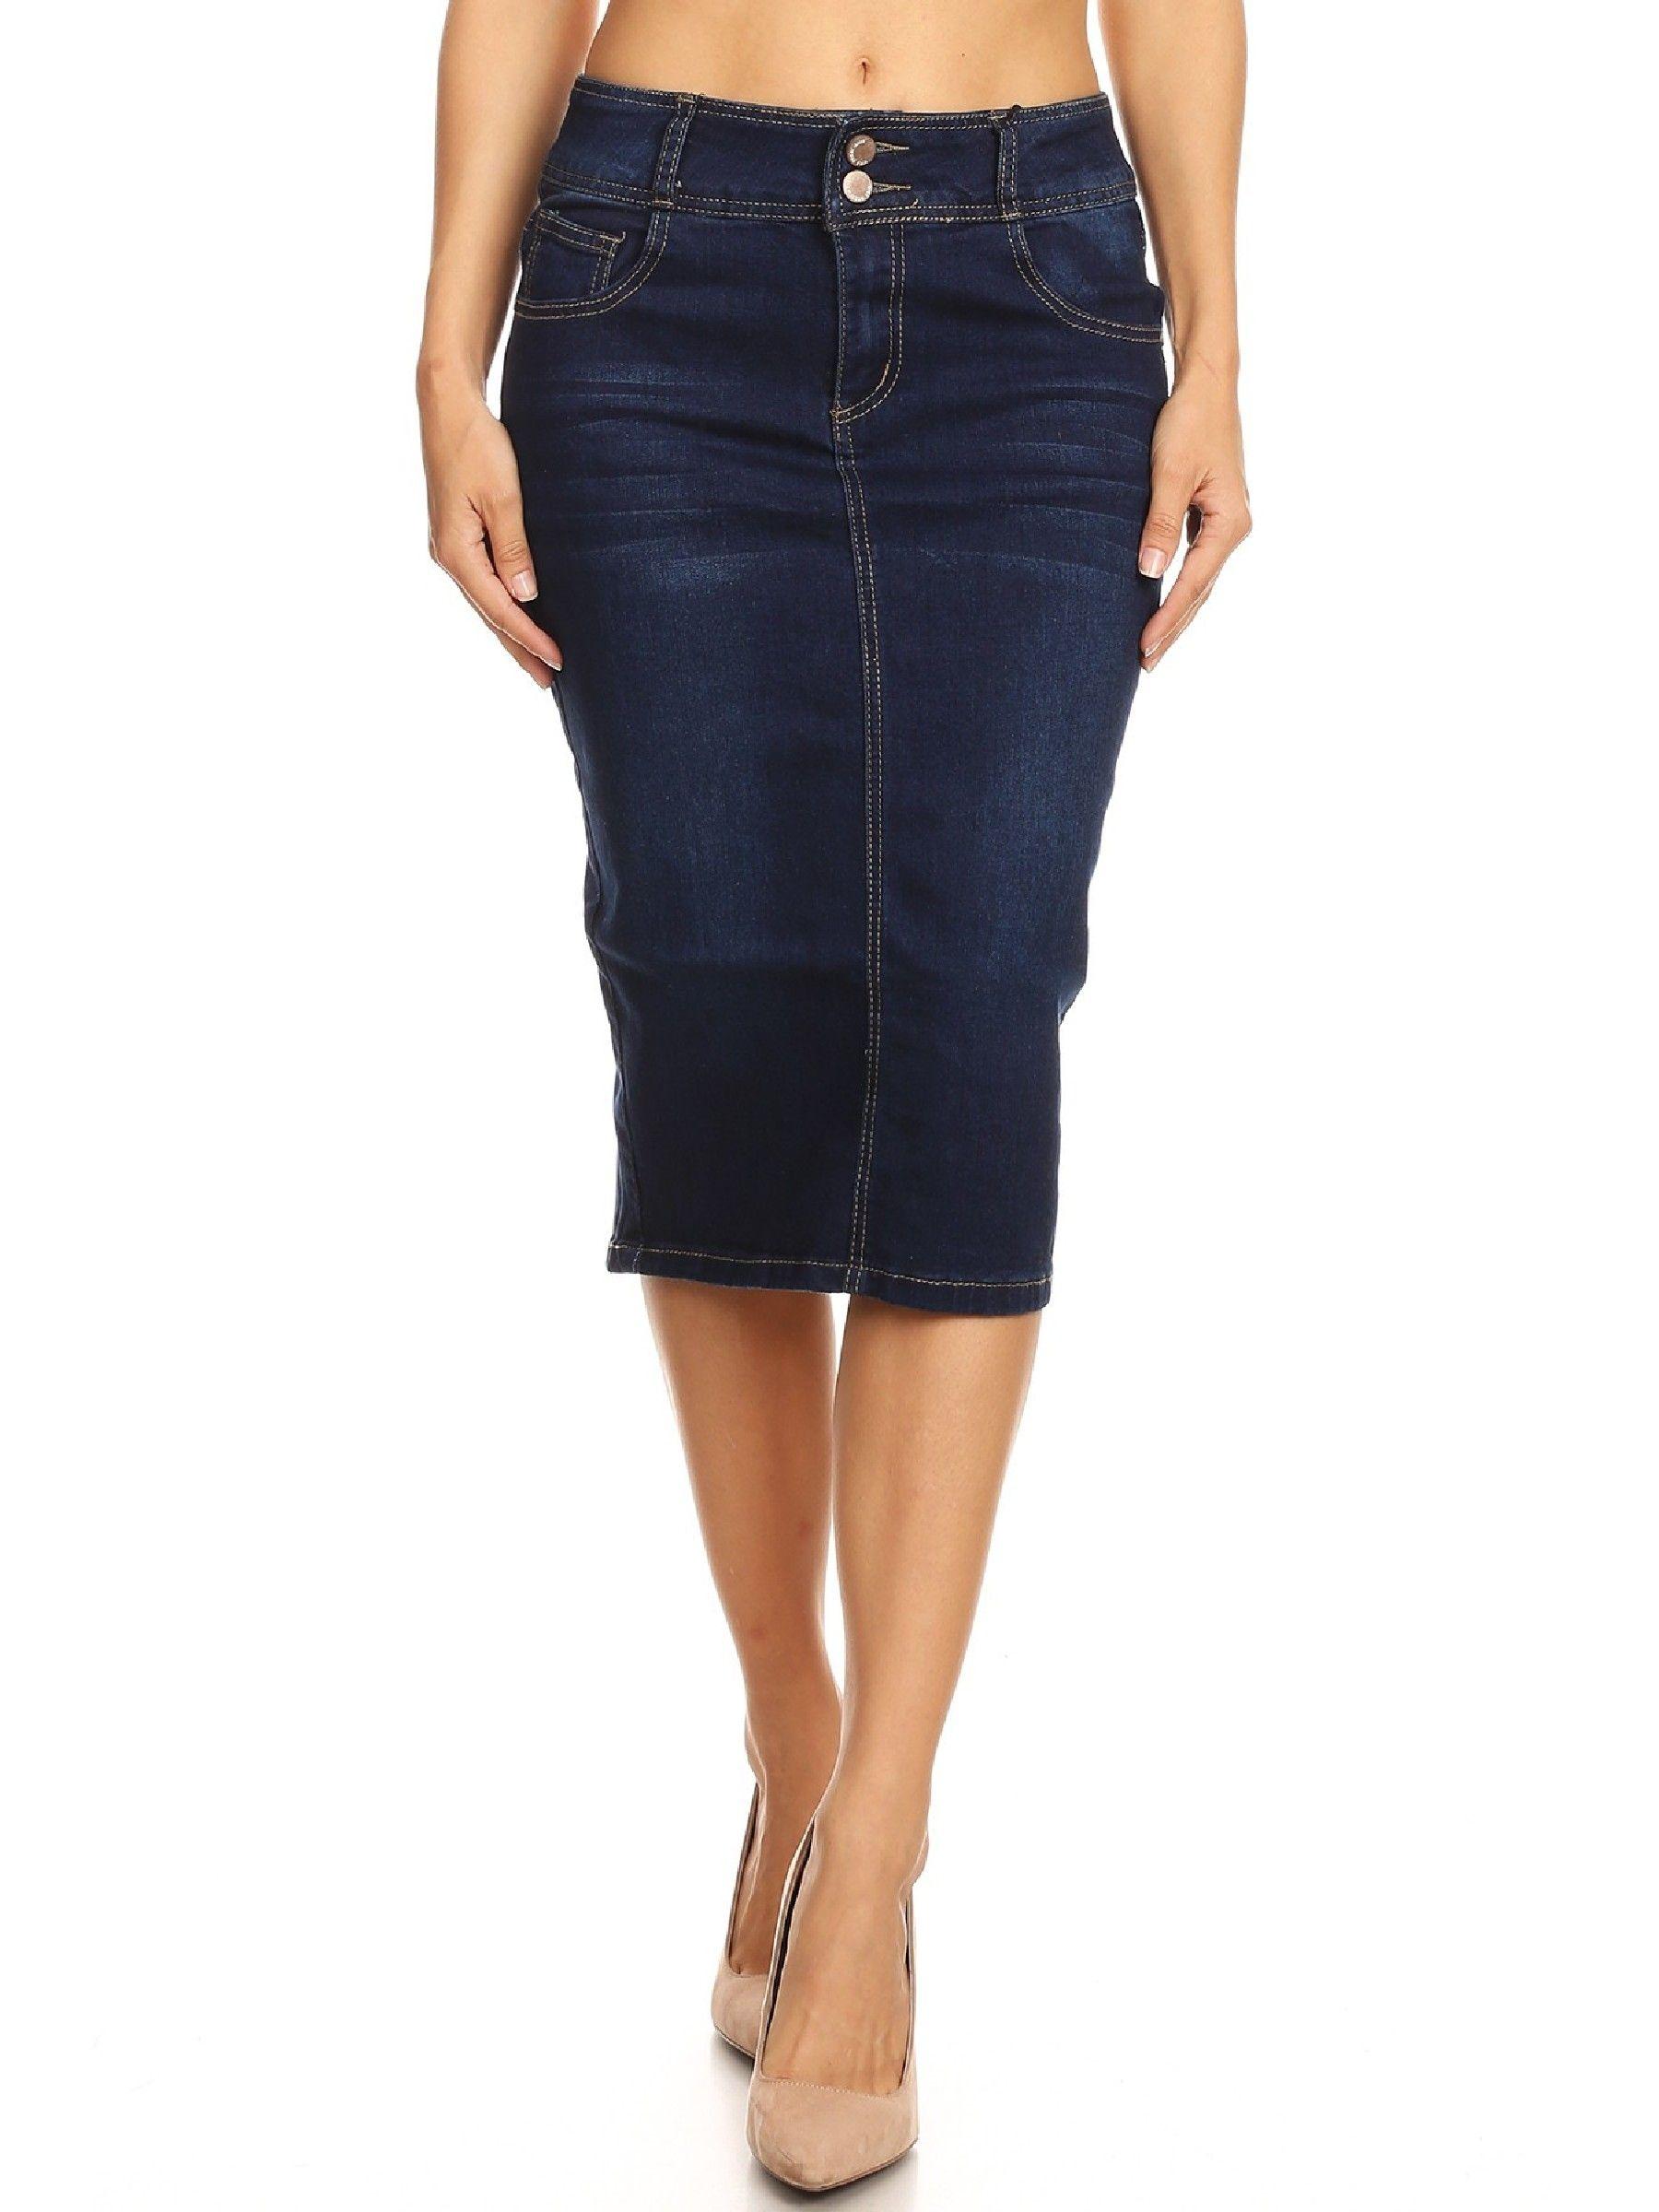 Fashion2Love Womens Juniors Mid Waist Below Knee Length Denim Skirt in a Pencil Silhouette